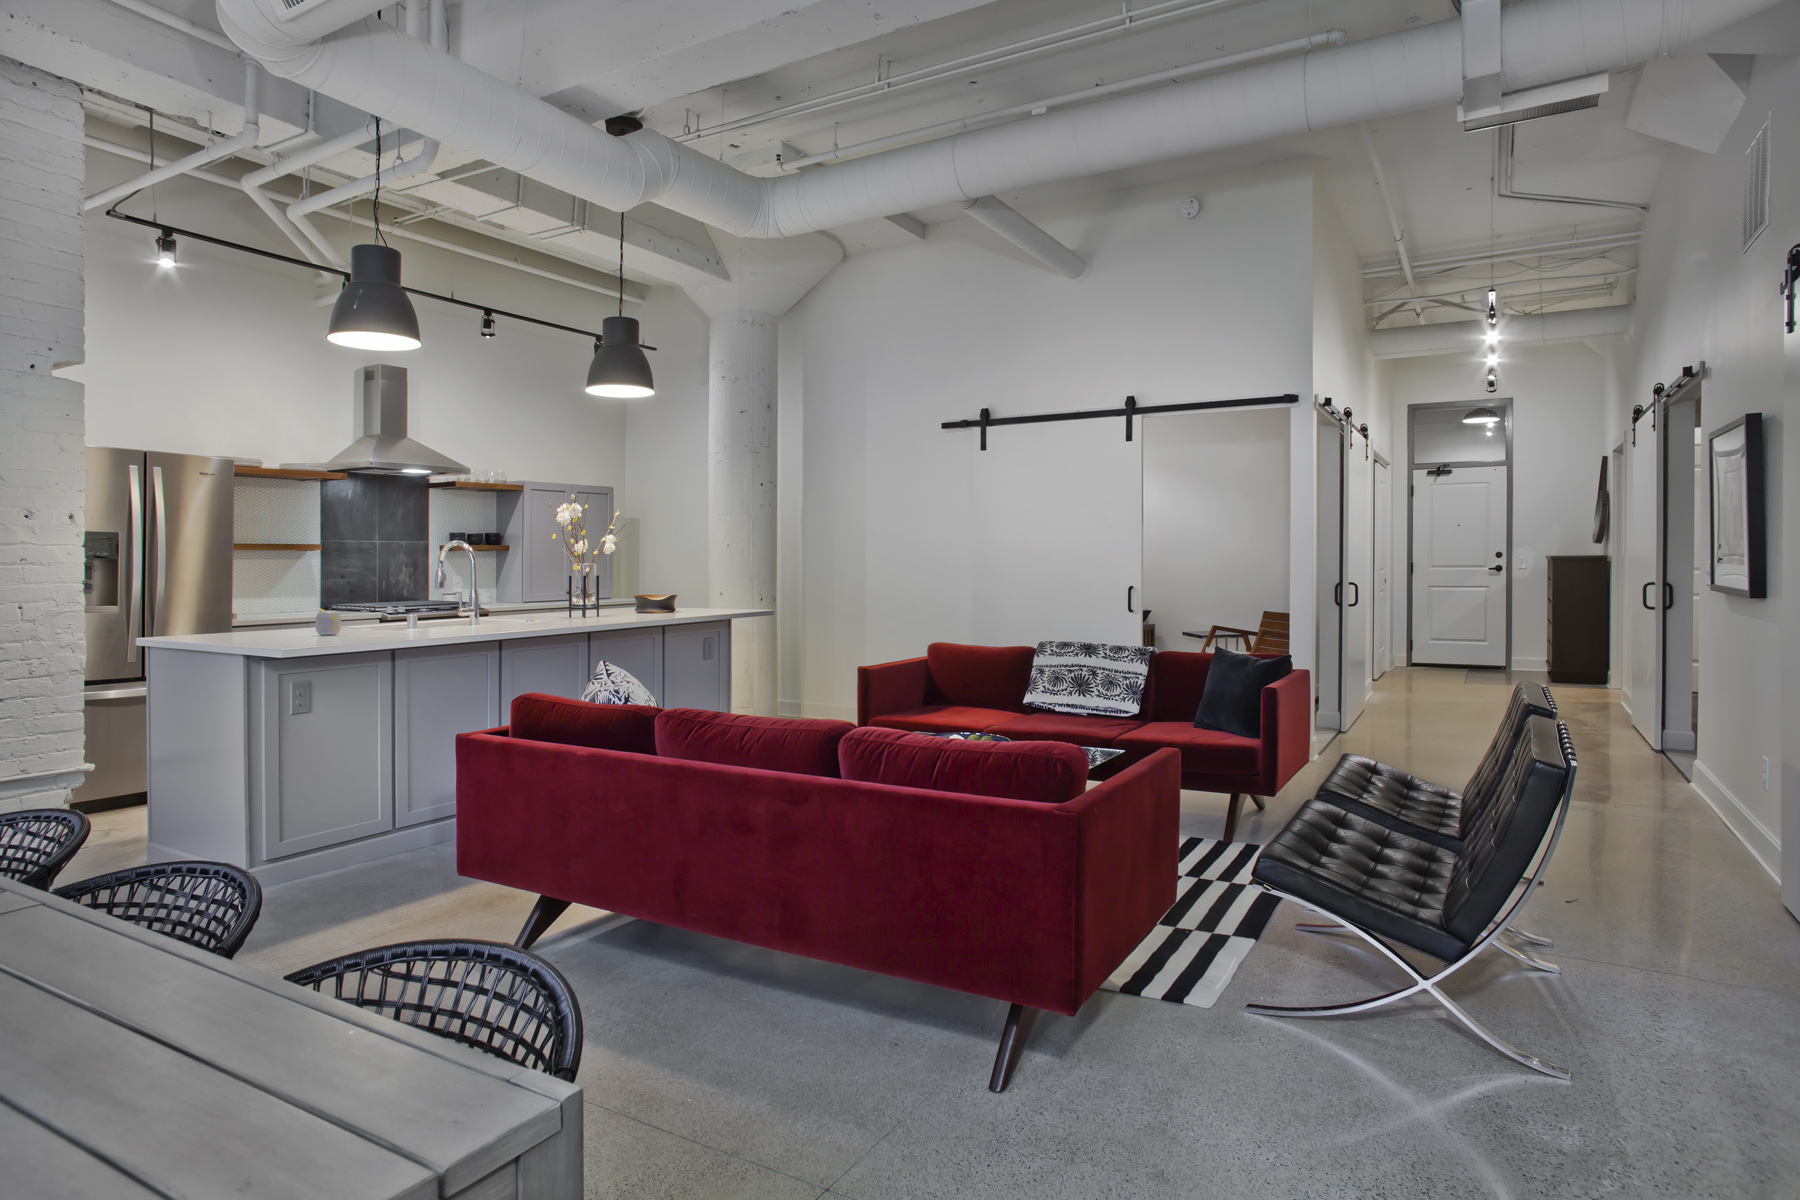 Smyth Lofts Typical Apartment.jpg